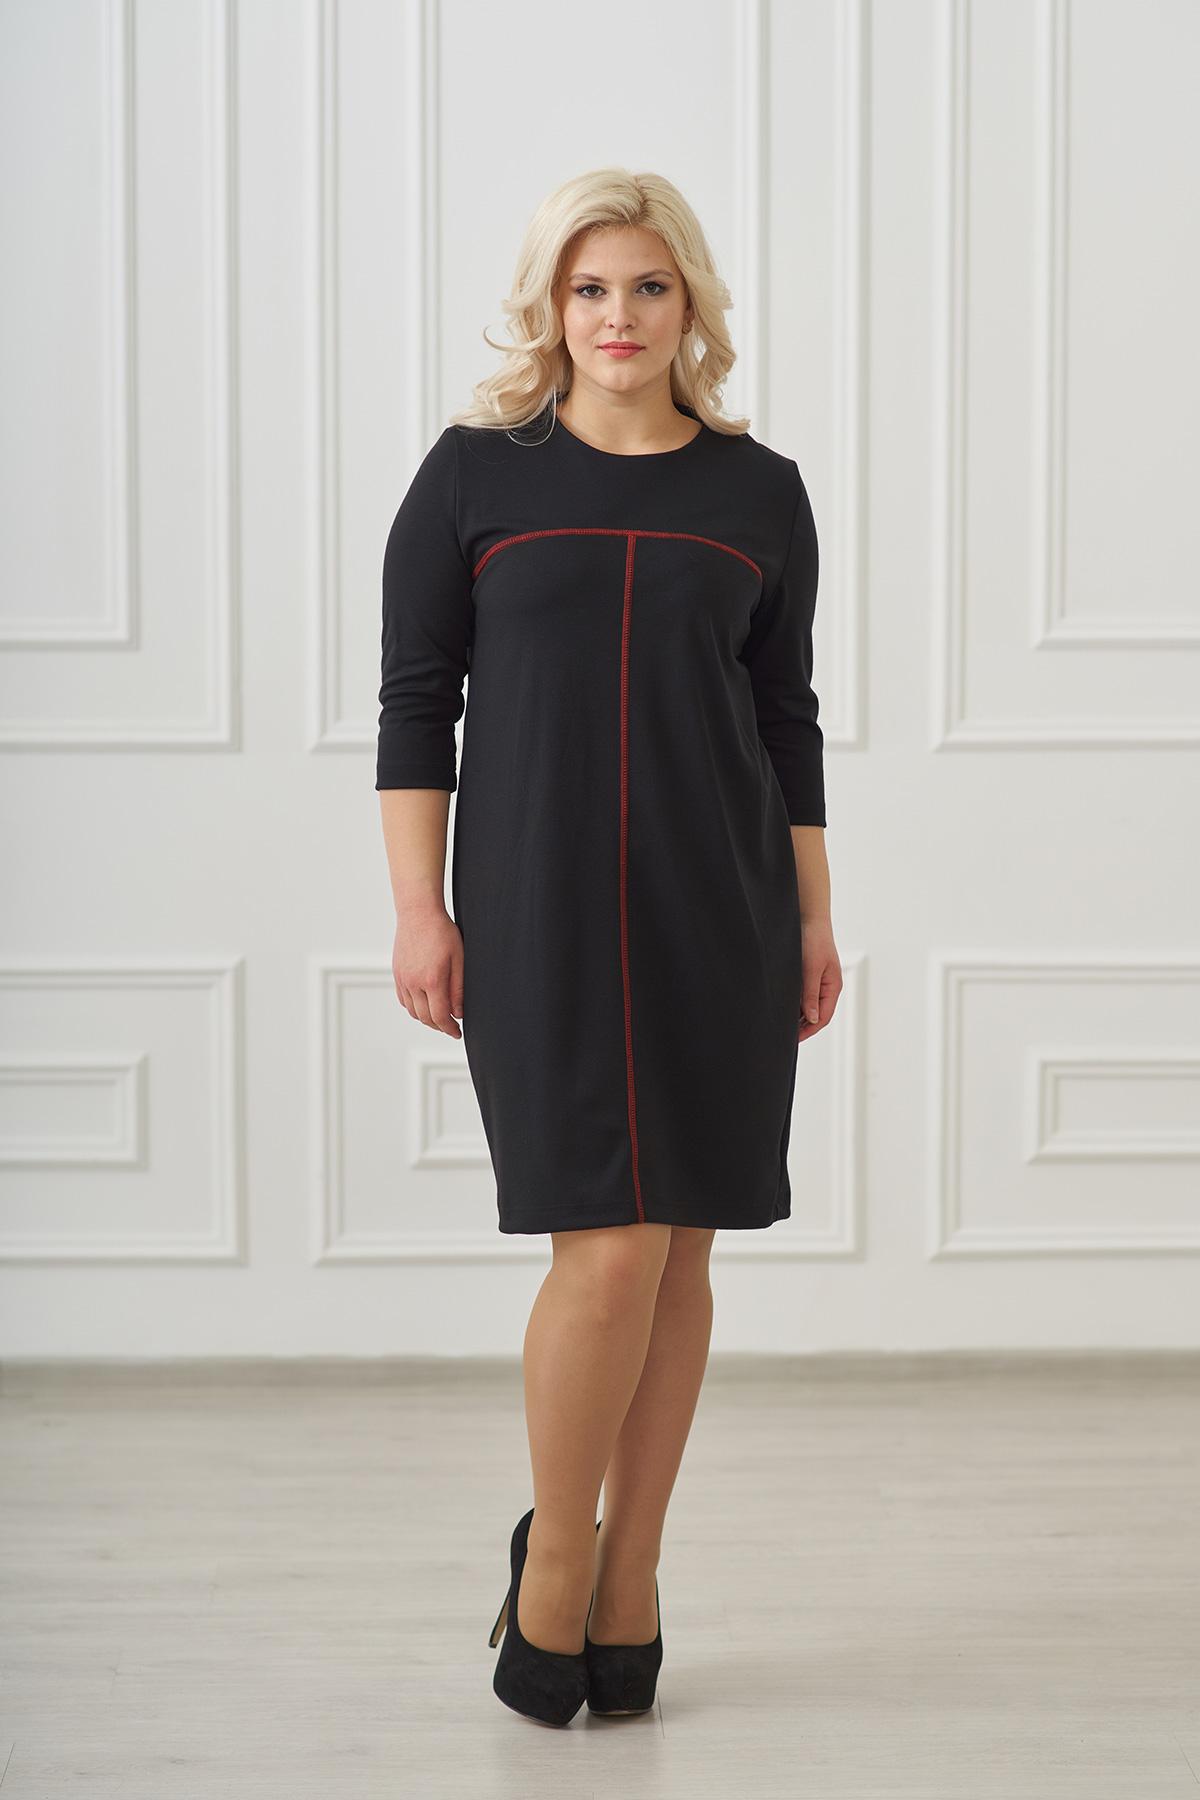 Жен. платье арт. 19-0025 Черный р. 52Платья<br>Факт. ОГ: 104 см <br>Факт. ОТ: 106 см <br>Факт. ОБ: 110 см <br>Длина по спинке: 98 см<br><br>Тип: Жен. платье<br>Размер: 52<br>Материал: Милано